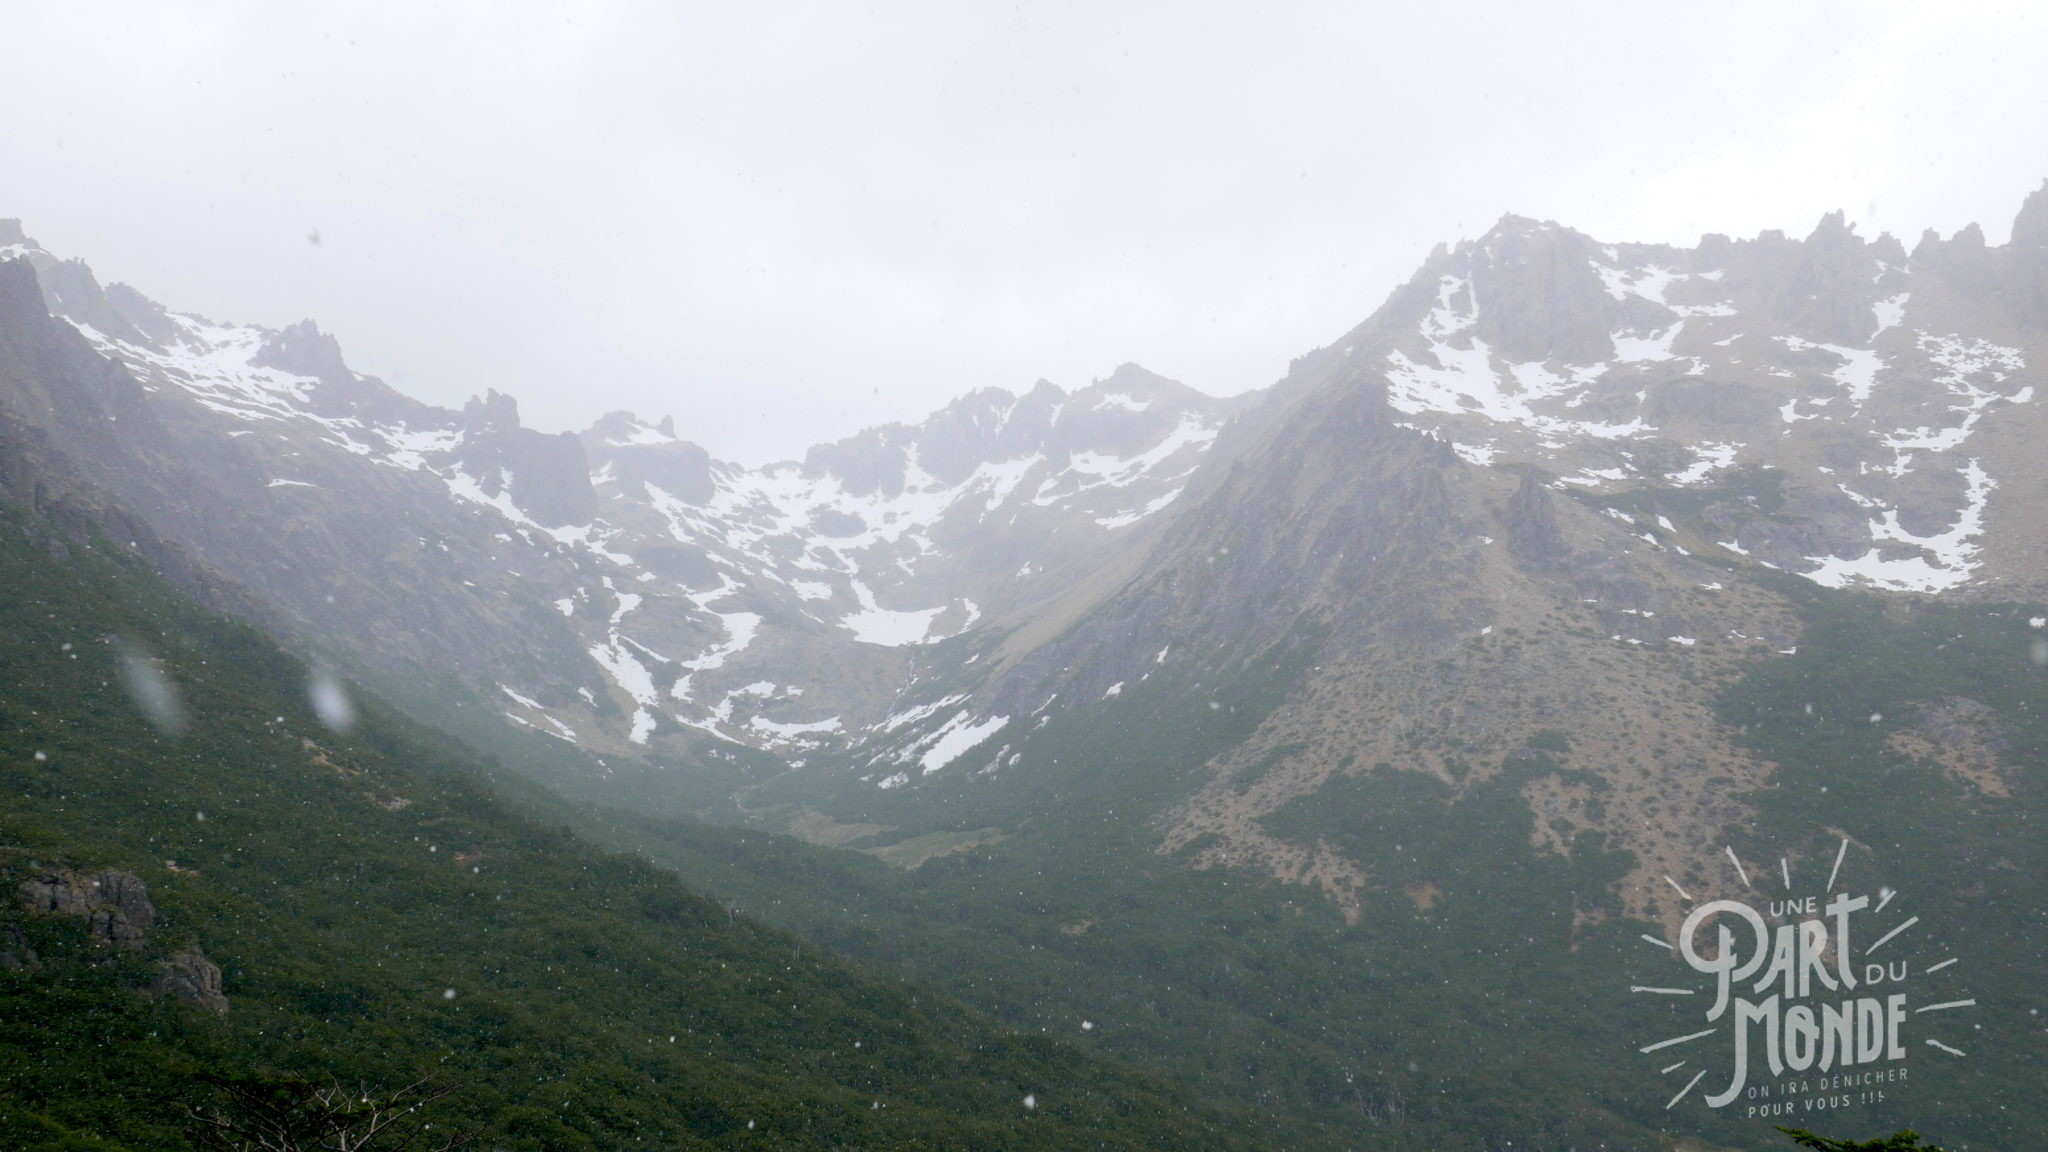 bariloche montagne refuge frey vue montagne2